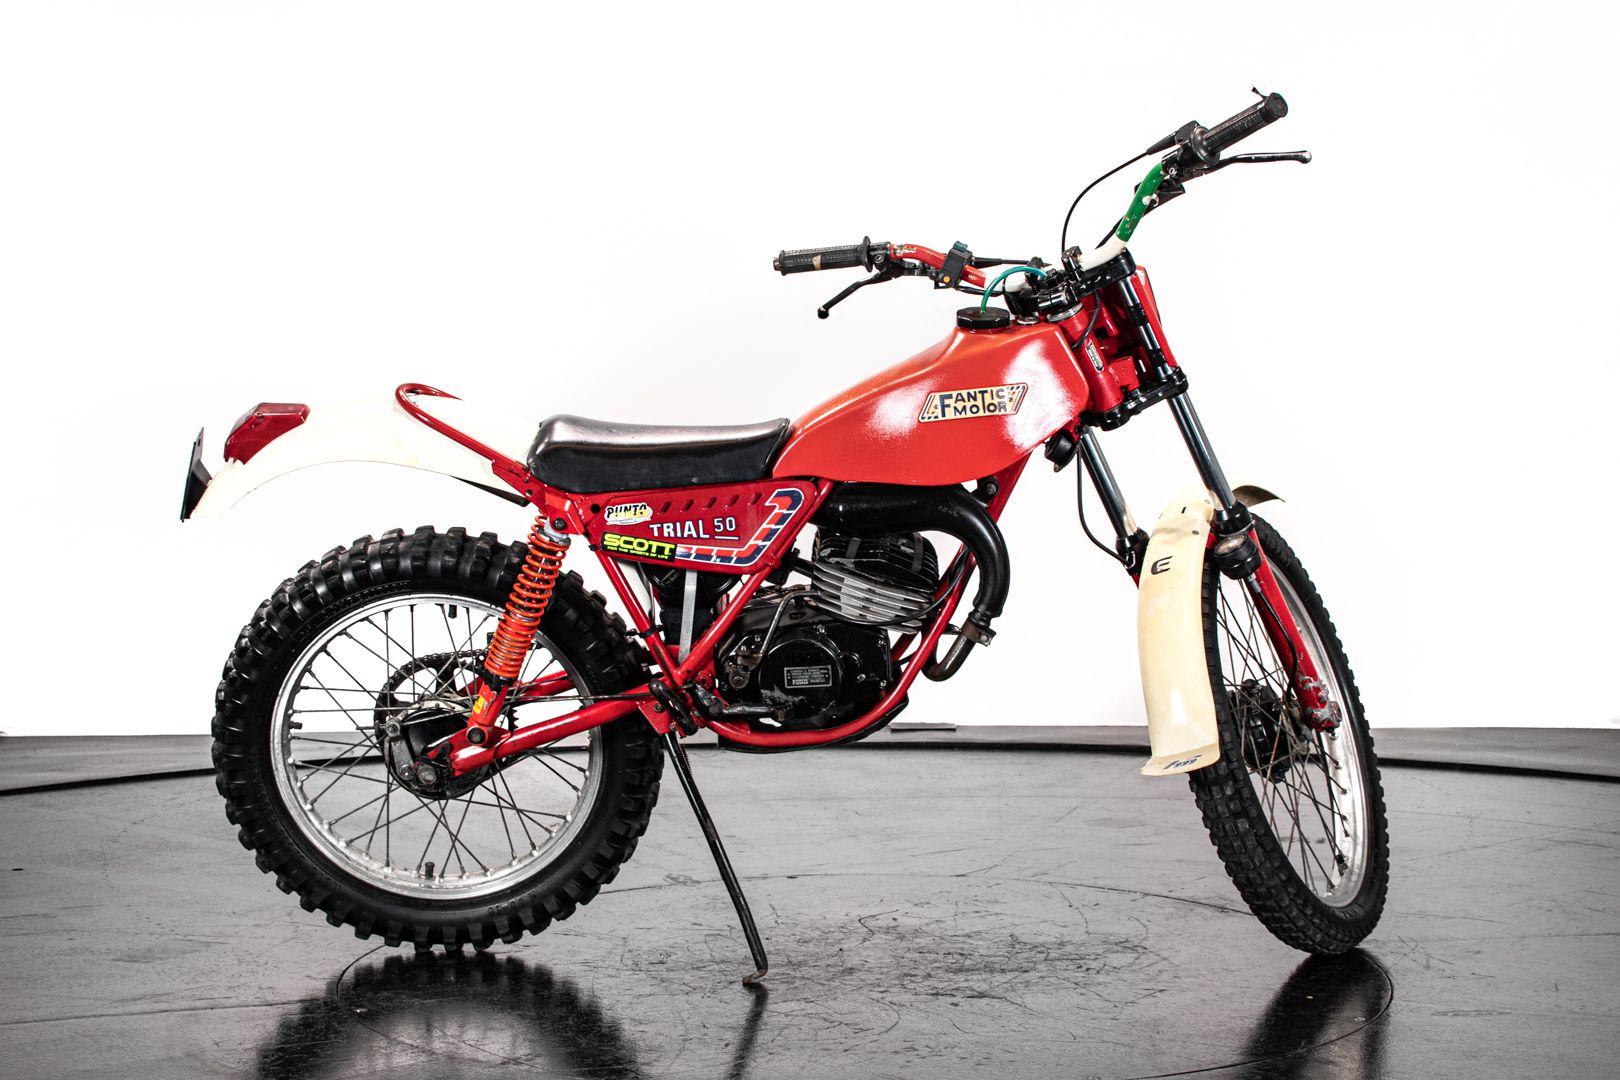 1984 Fantic Motor Trial 50 330 66839